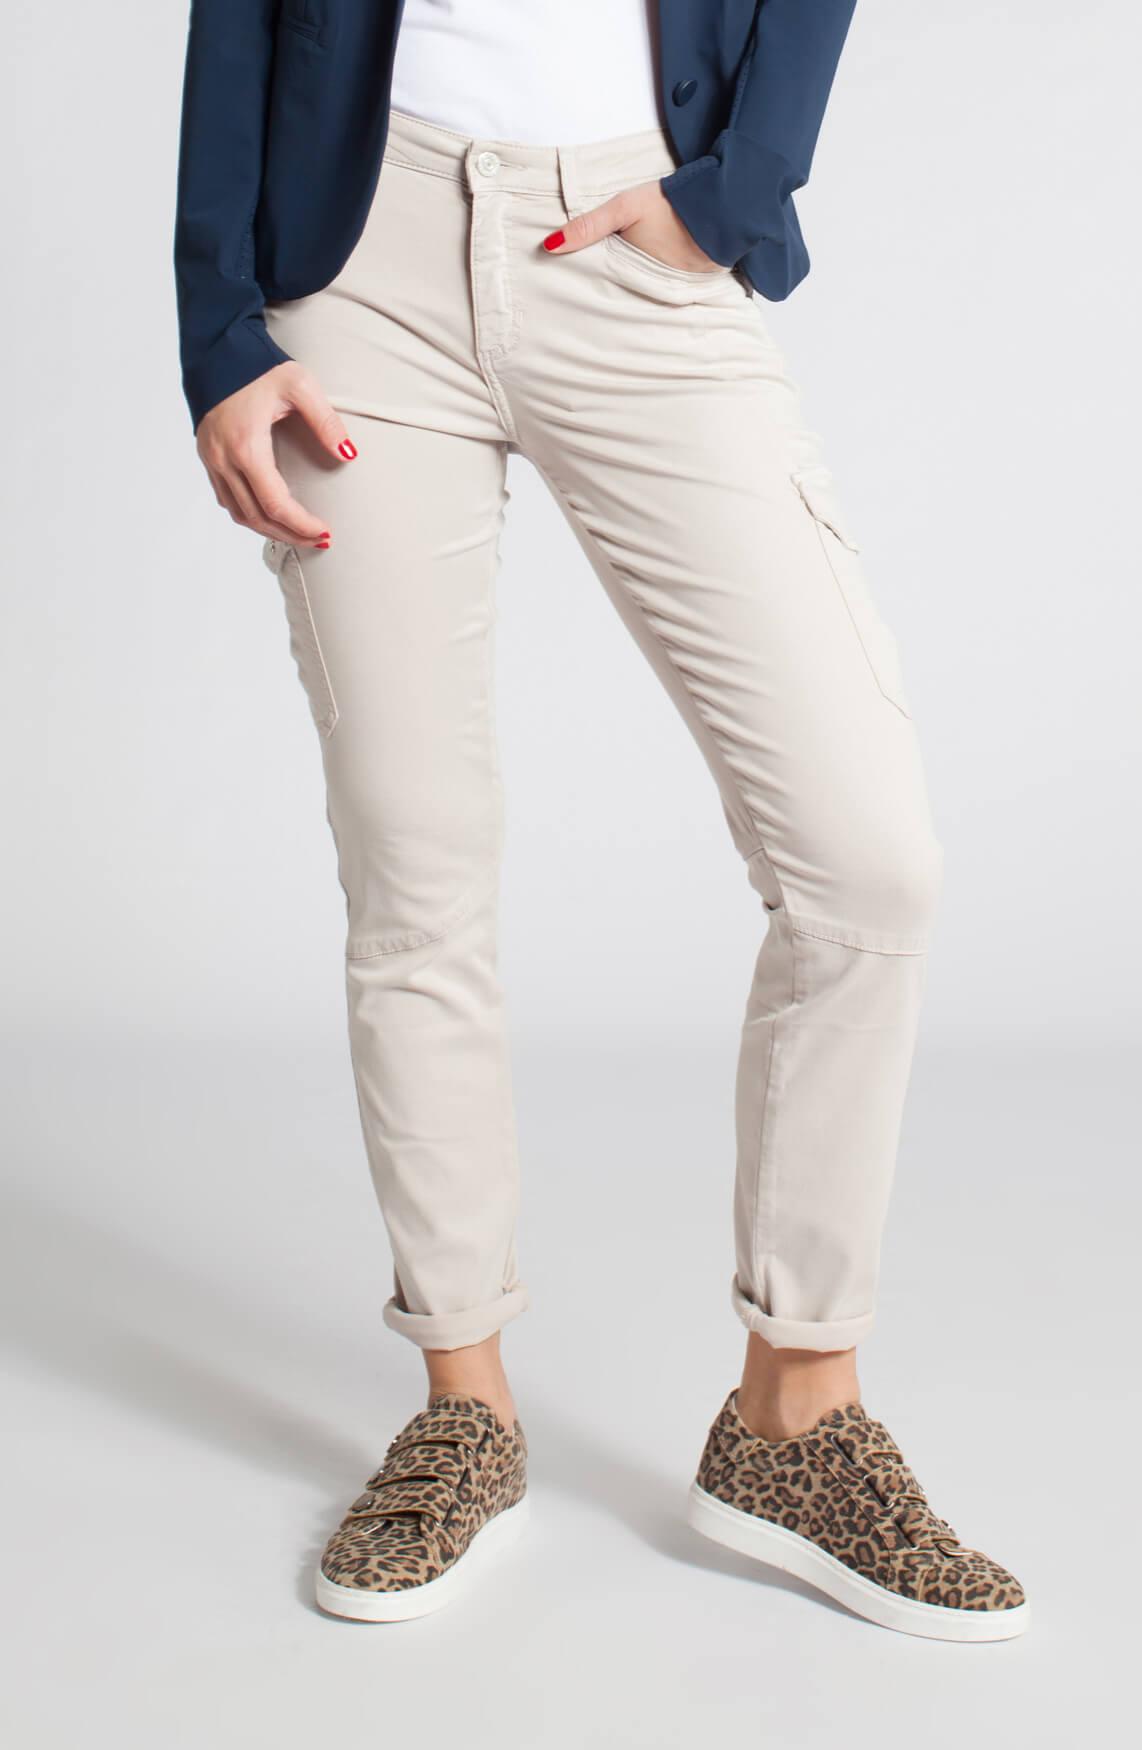 Rosner Dames Antonia katoenen jeans 0